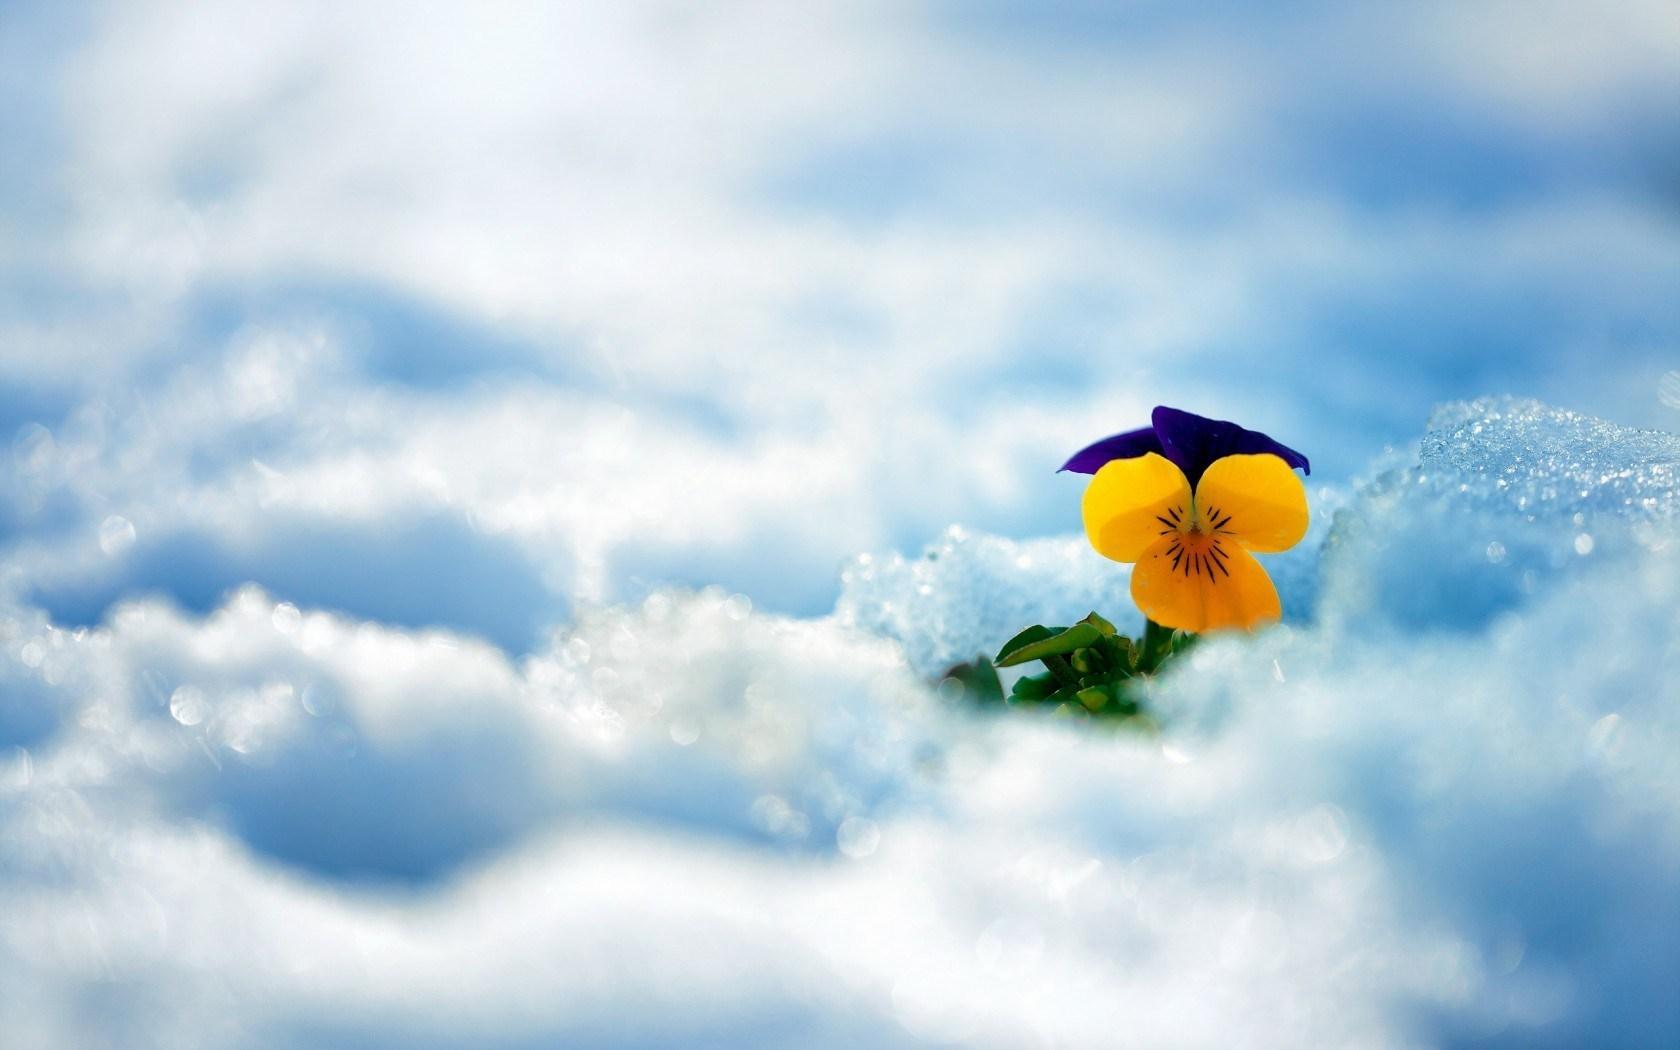 Spring Snow Flower Pansy